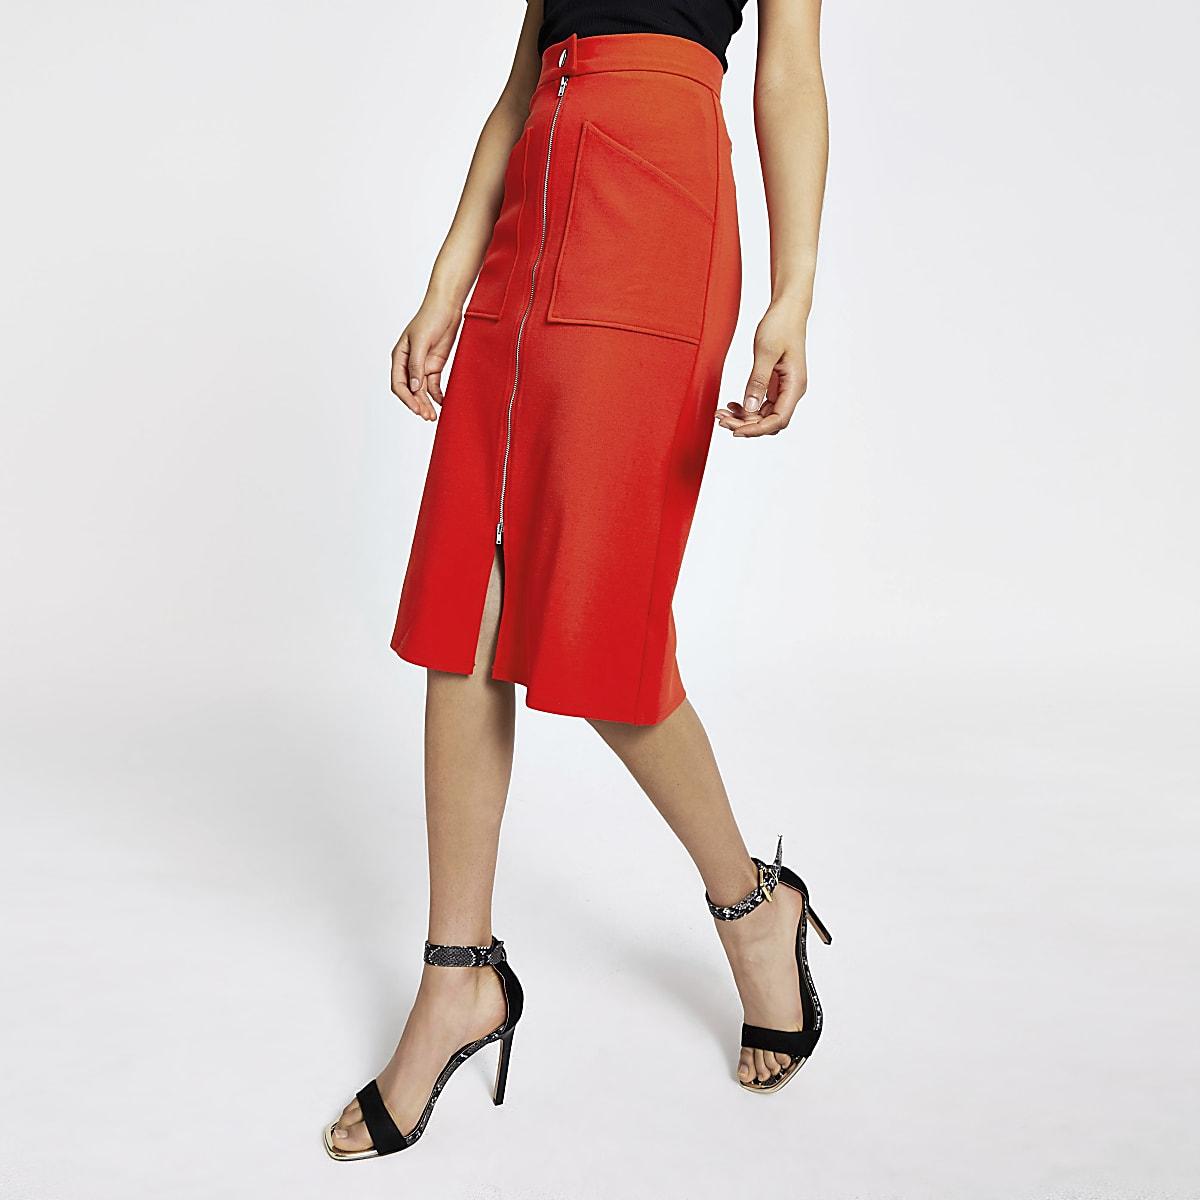 Red zip front pencil skirt